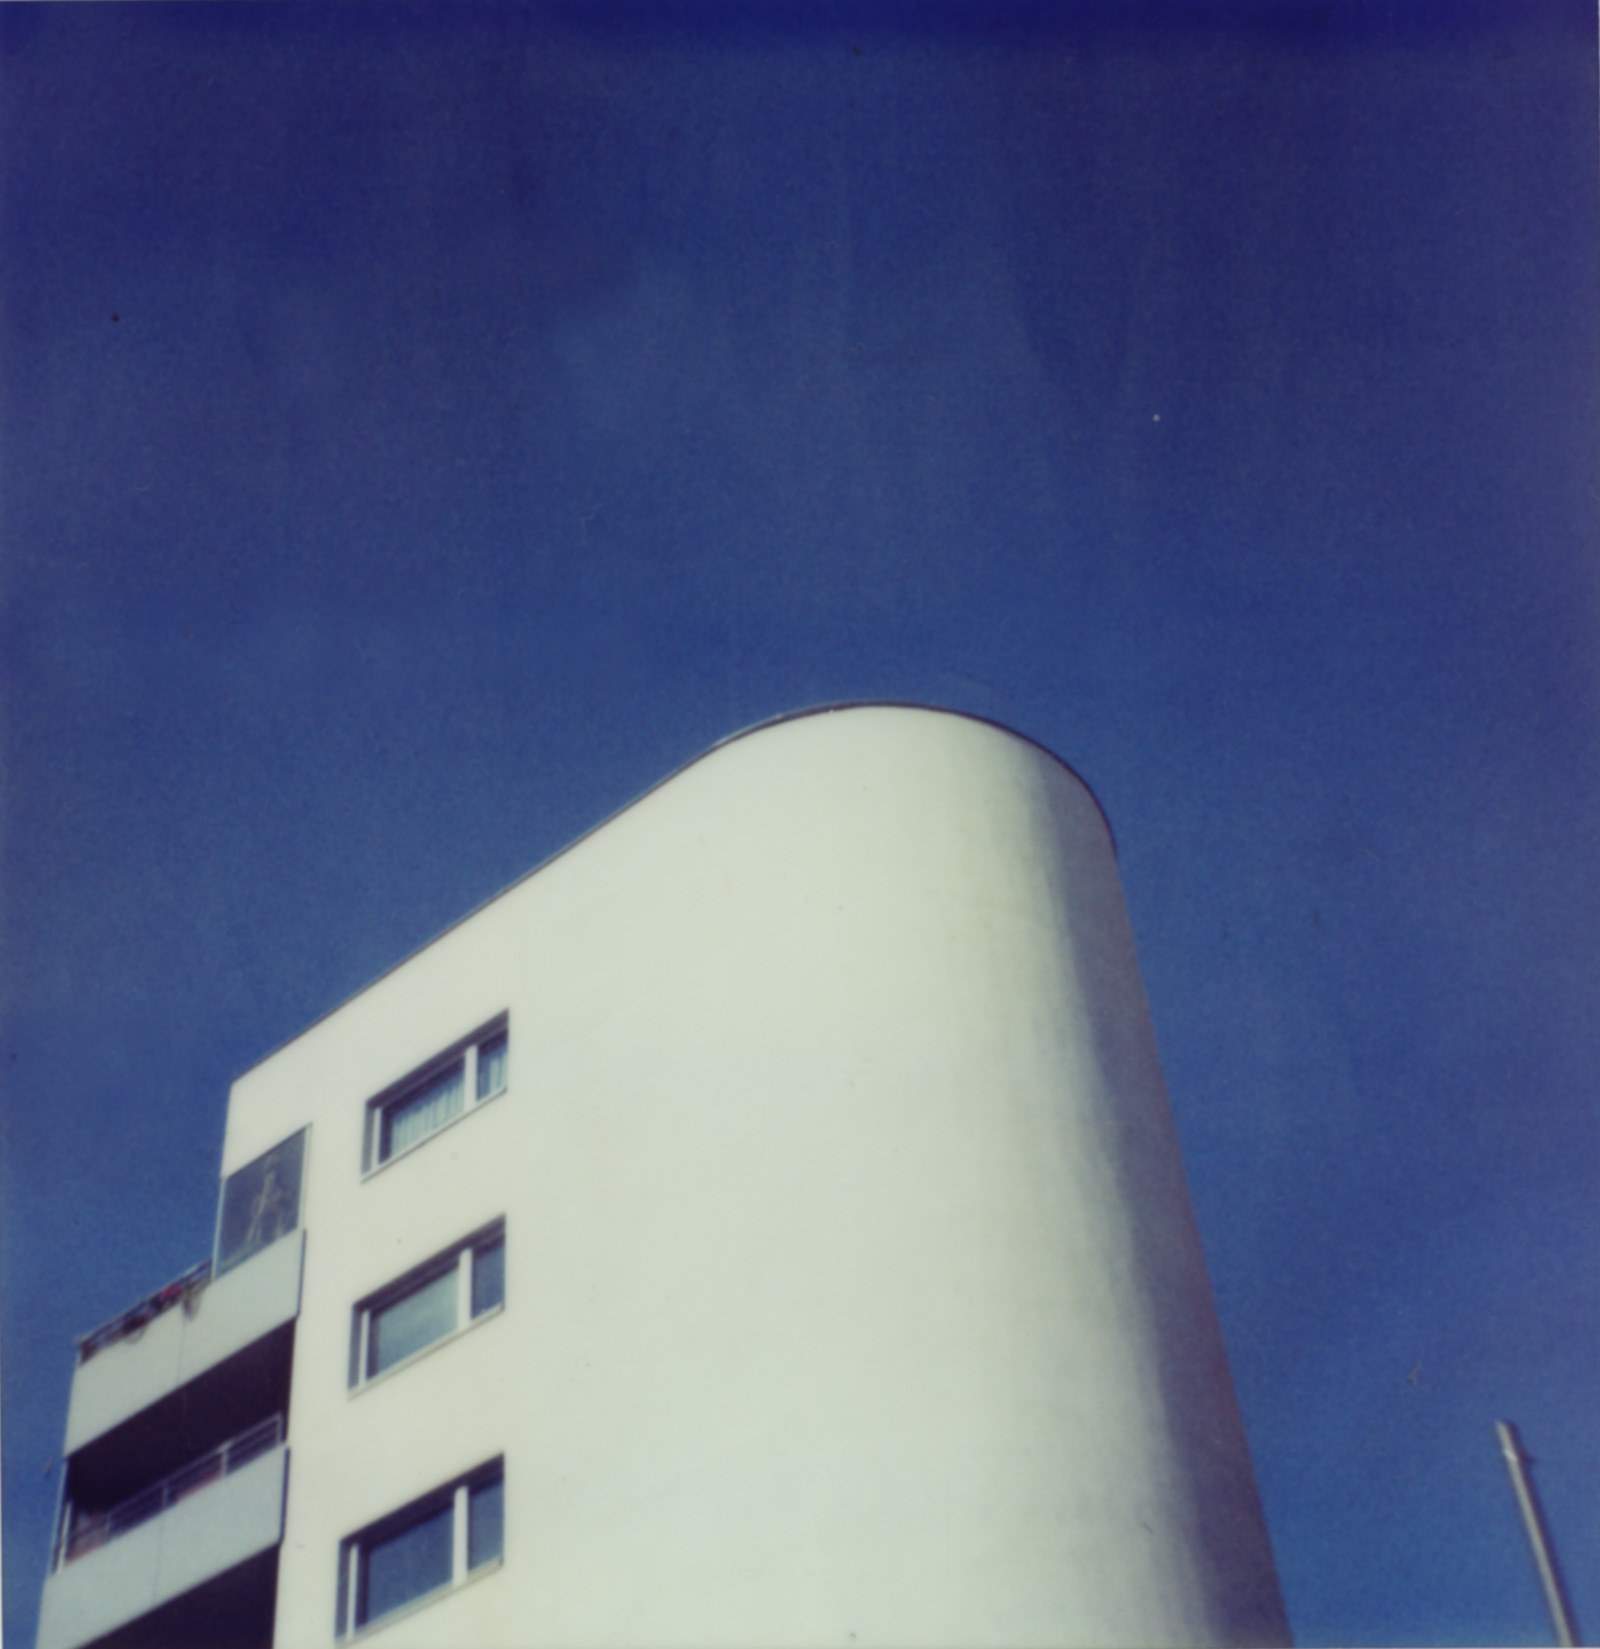 White, Apartment, Austria, Bspo06, Building, HQ Photo